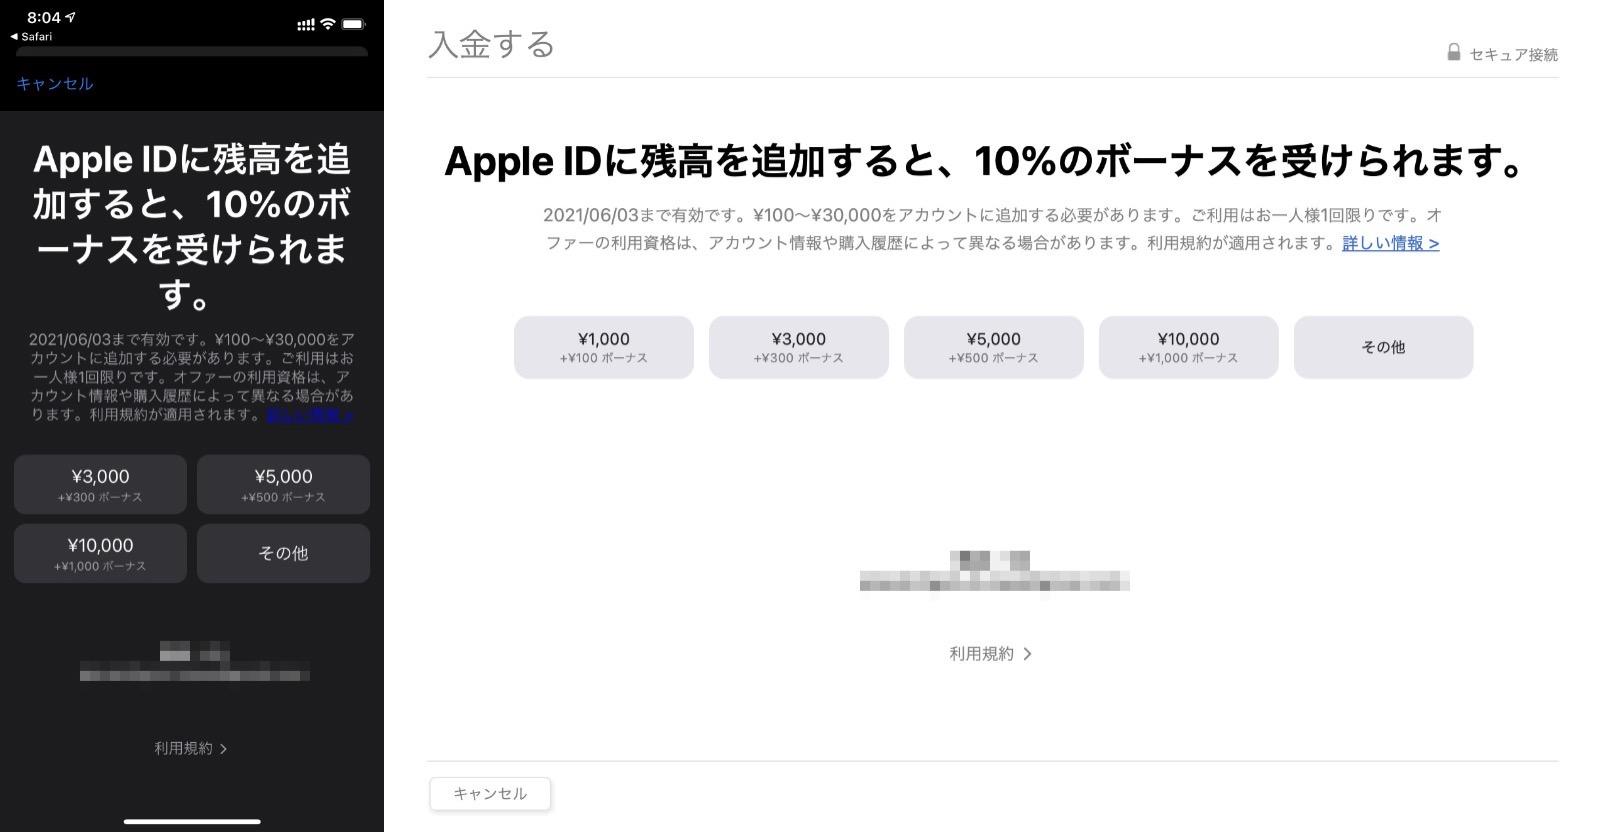 Apple ID 10Percent cashback 2